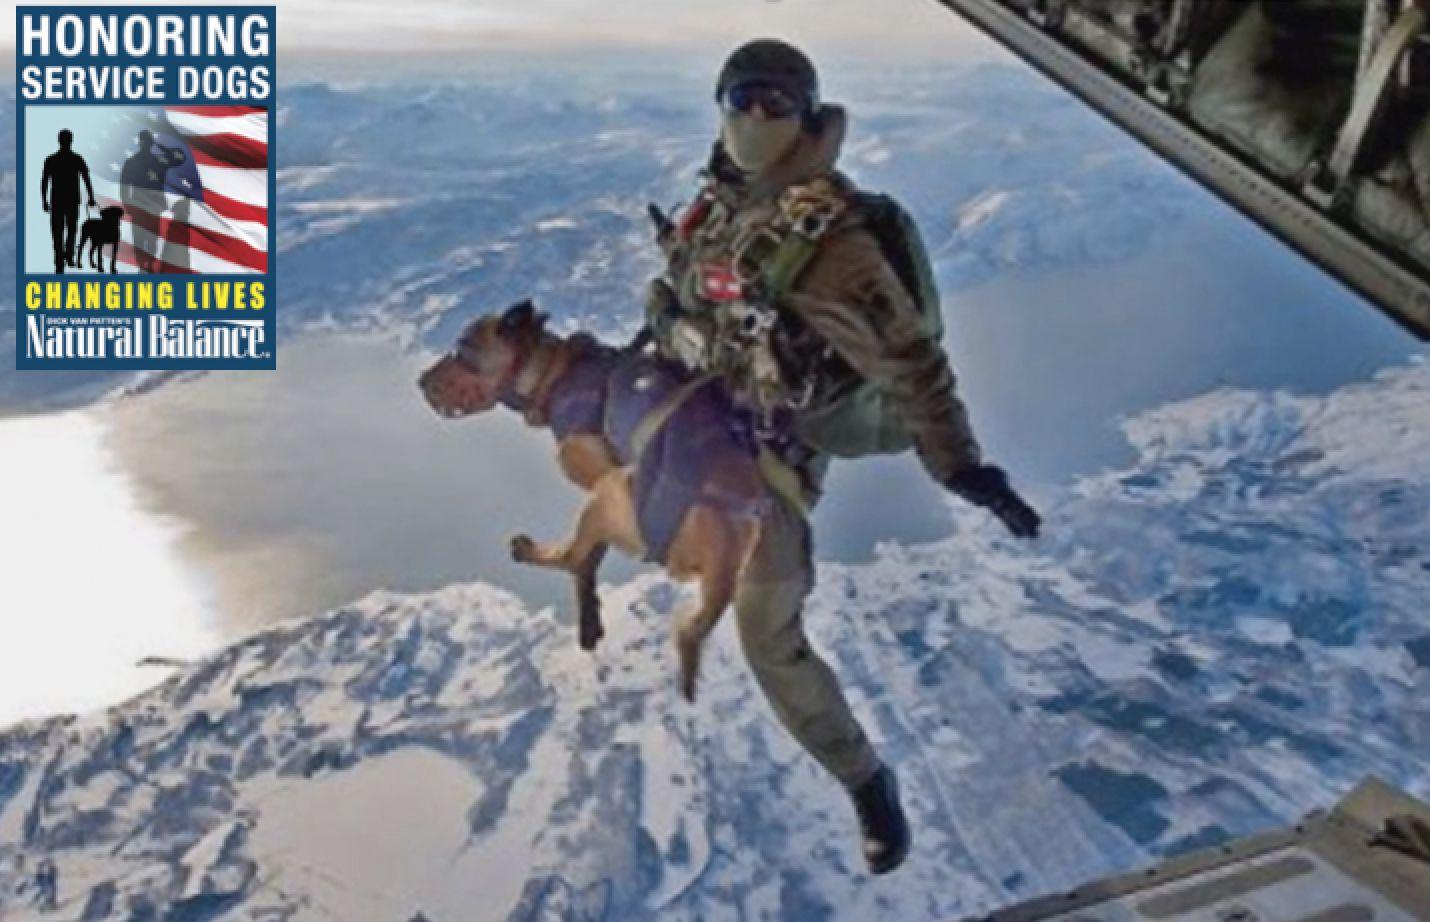 military+working+dog+parachute+service+dog+month+petco+natural+balance.jpg (1430×922)